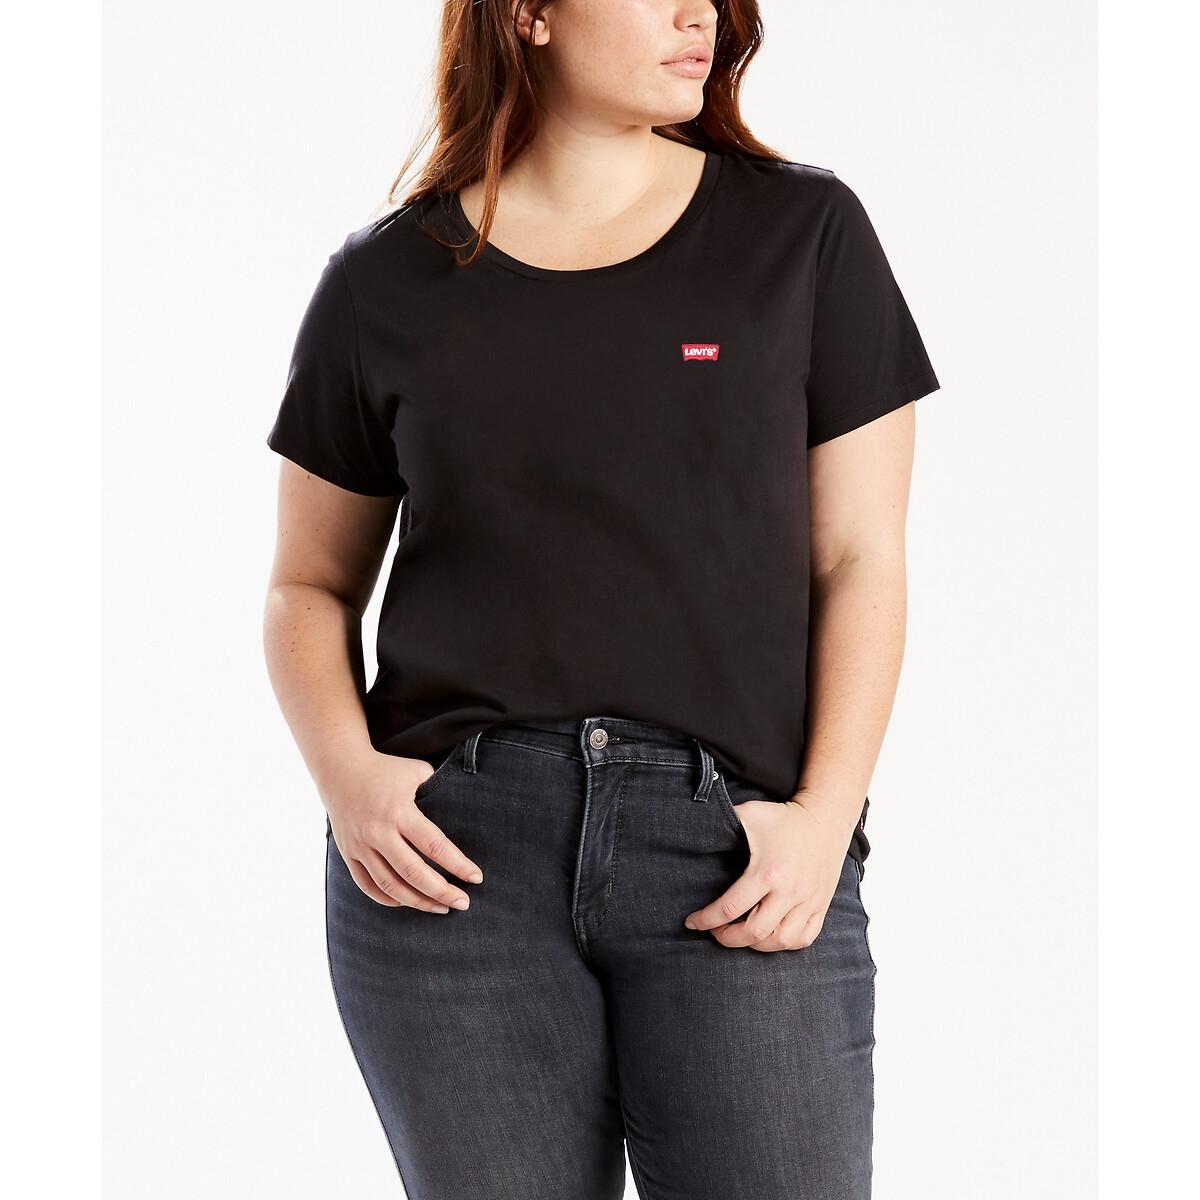 Camiseta de manga corta con logotipo delante